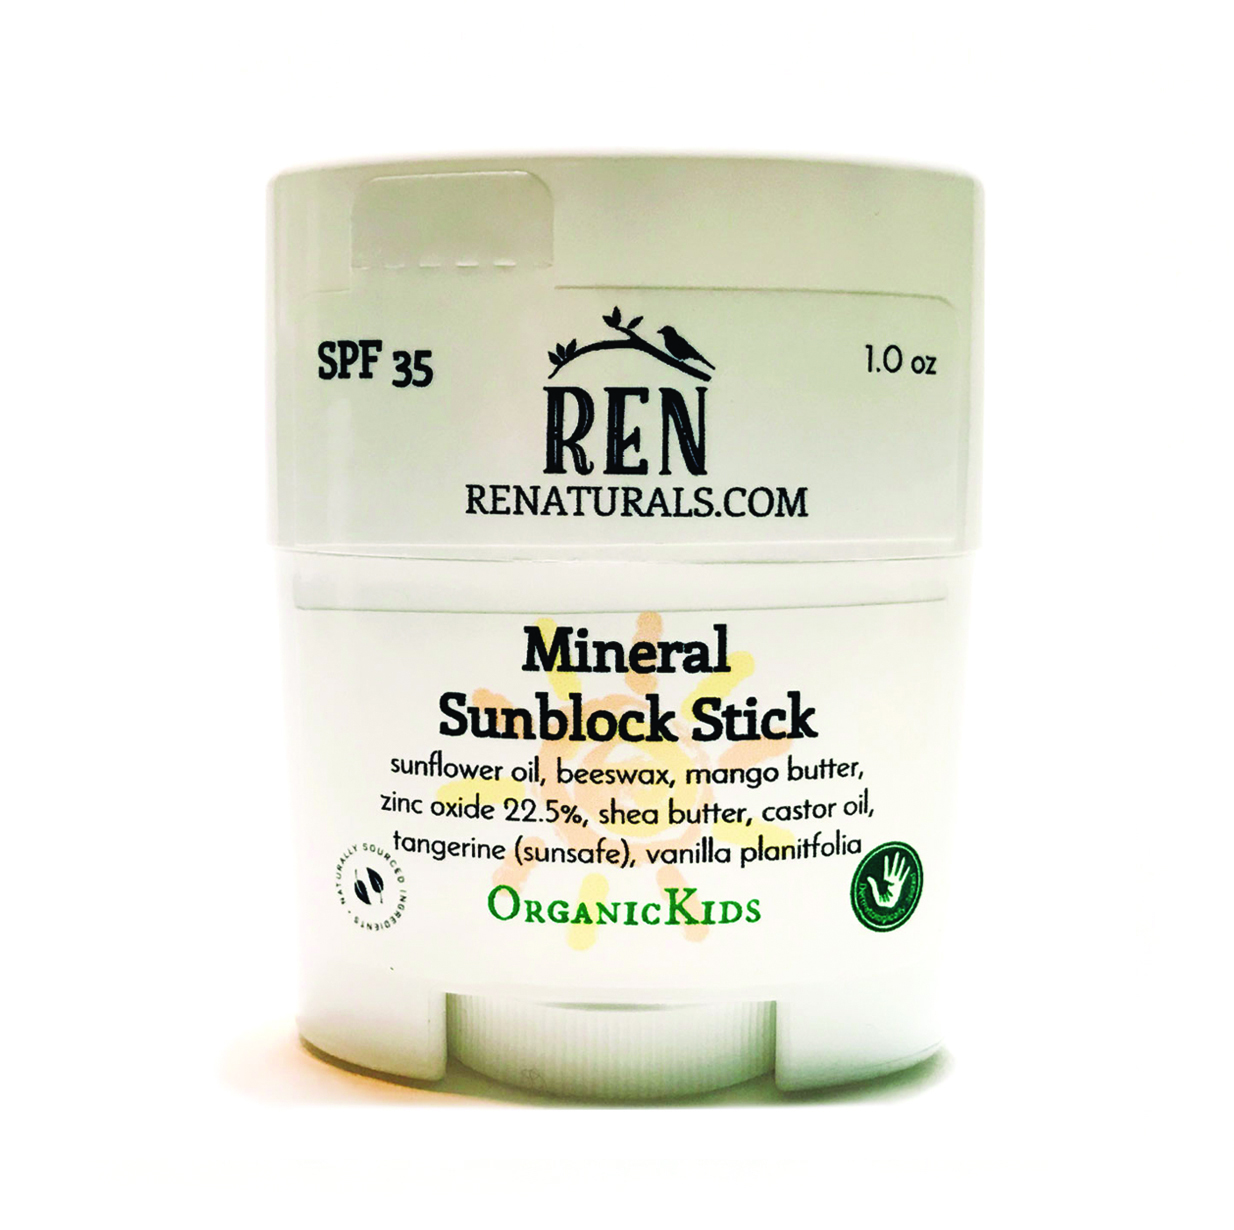 ReNaturals: Botanical Skincare Mineral Sunblock Stick SPF 35 1 oz.